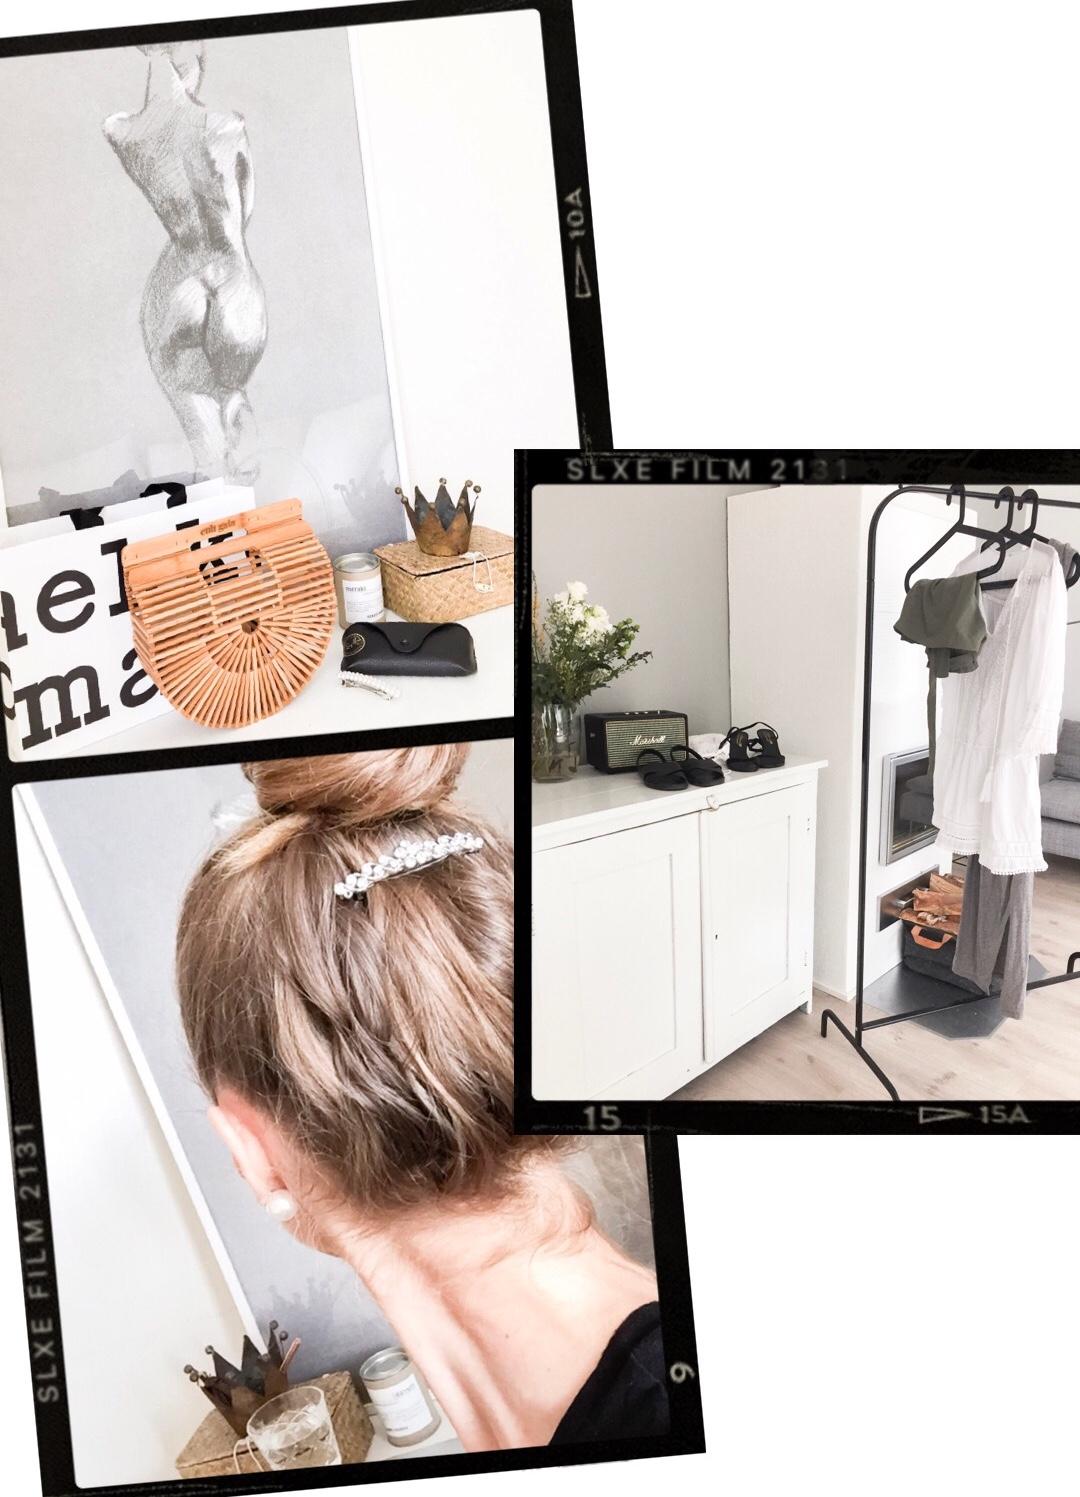 home-interiors-cult-gaia-details-youtube-second-hand-haul-hair-clip-koti-sisustus-yksityiskohdat-hiusasuste